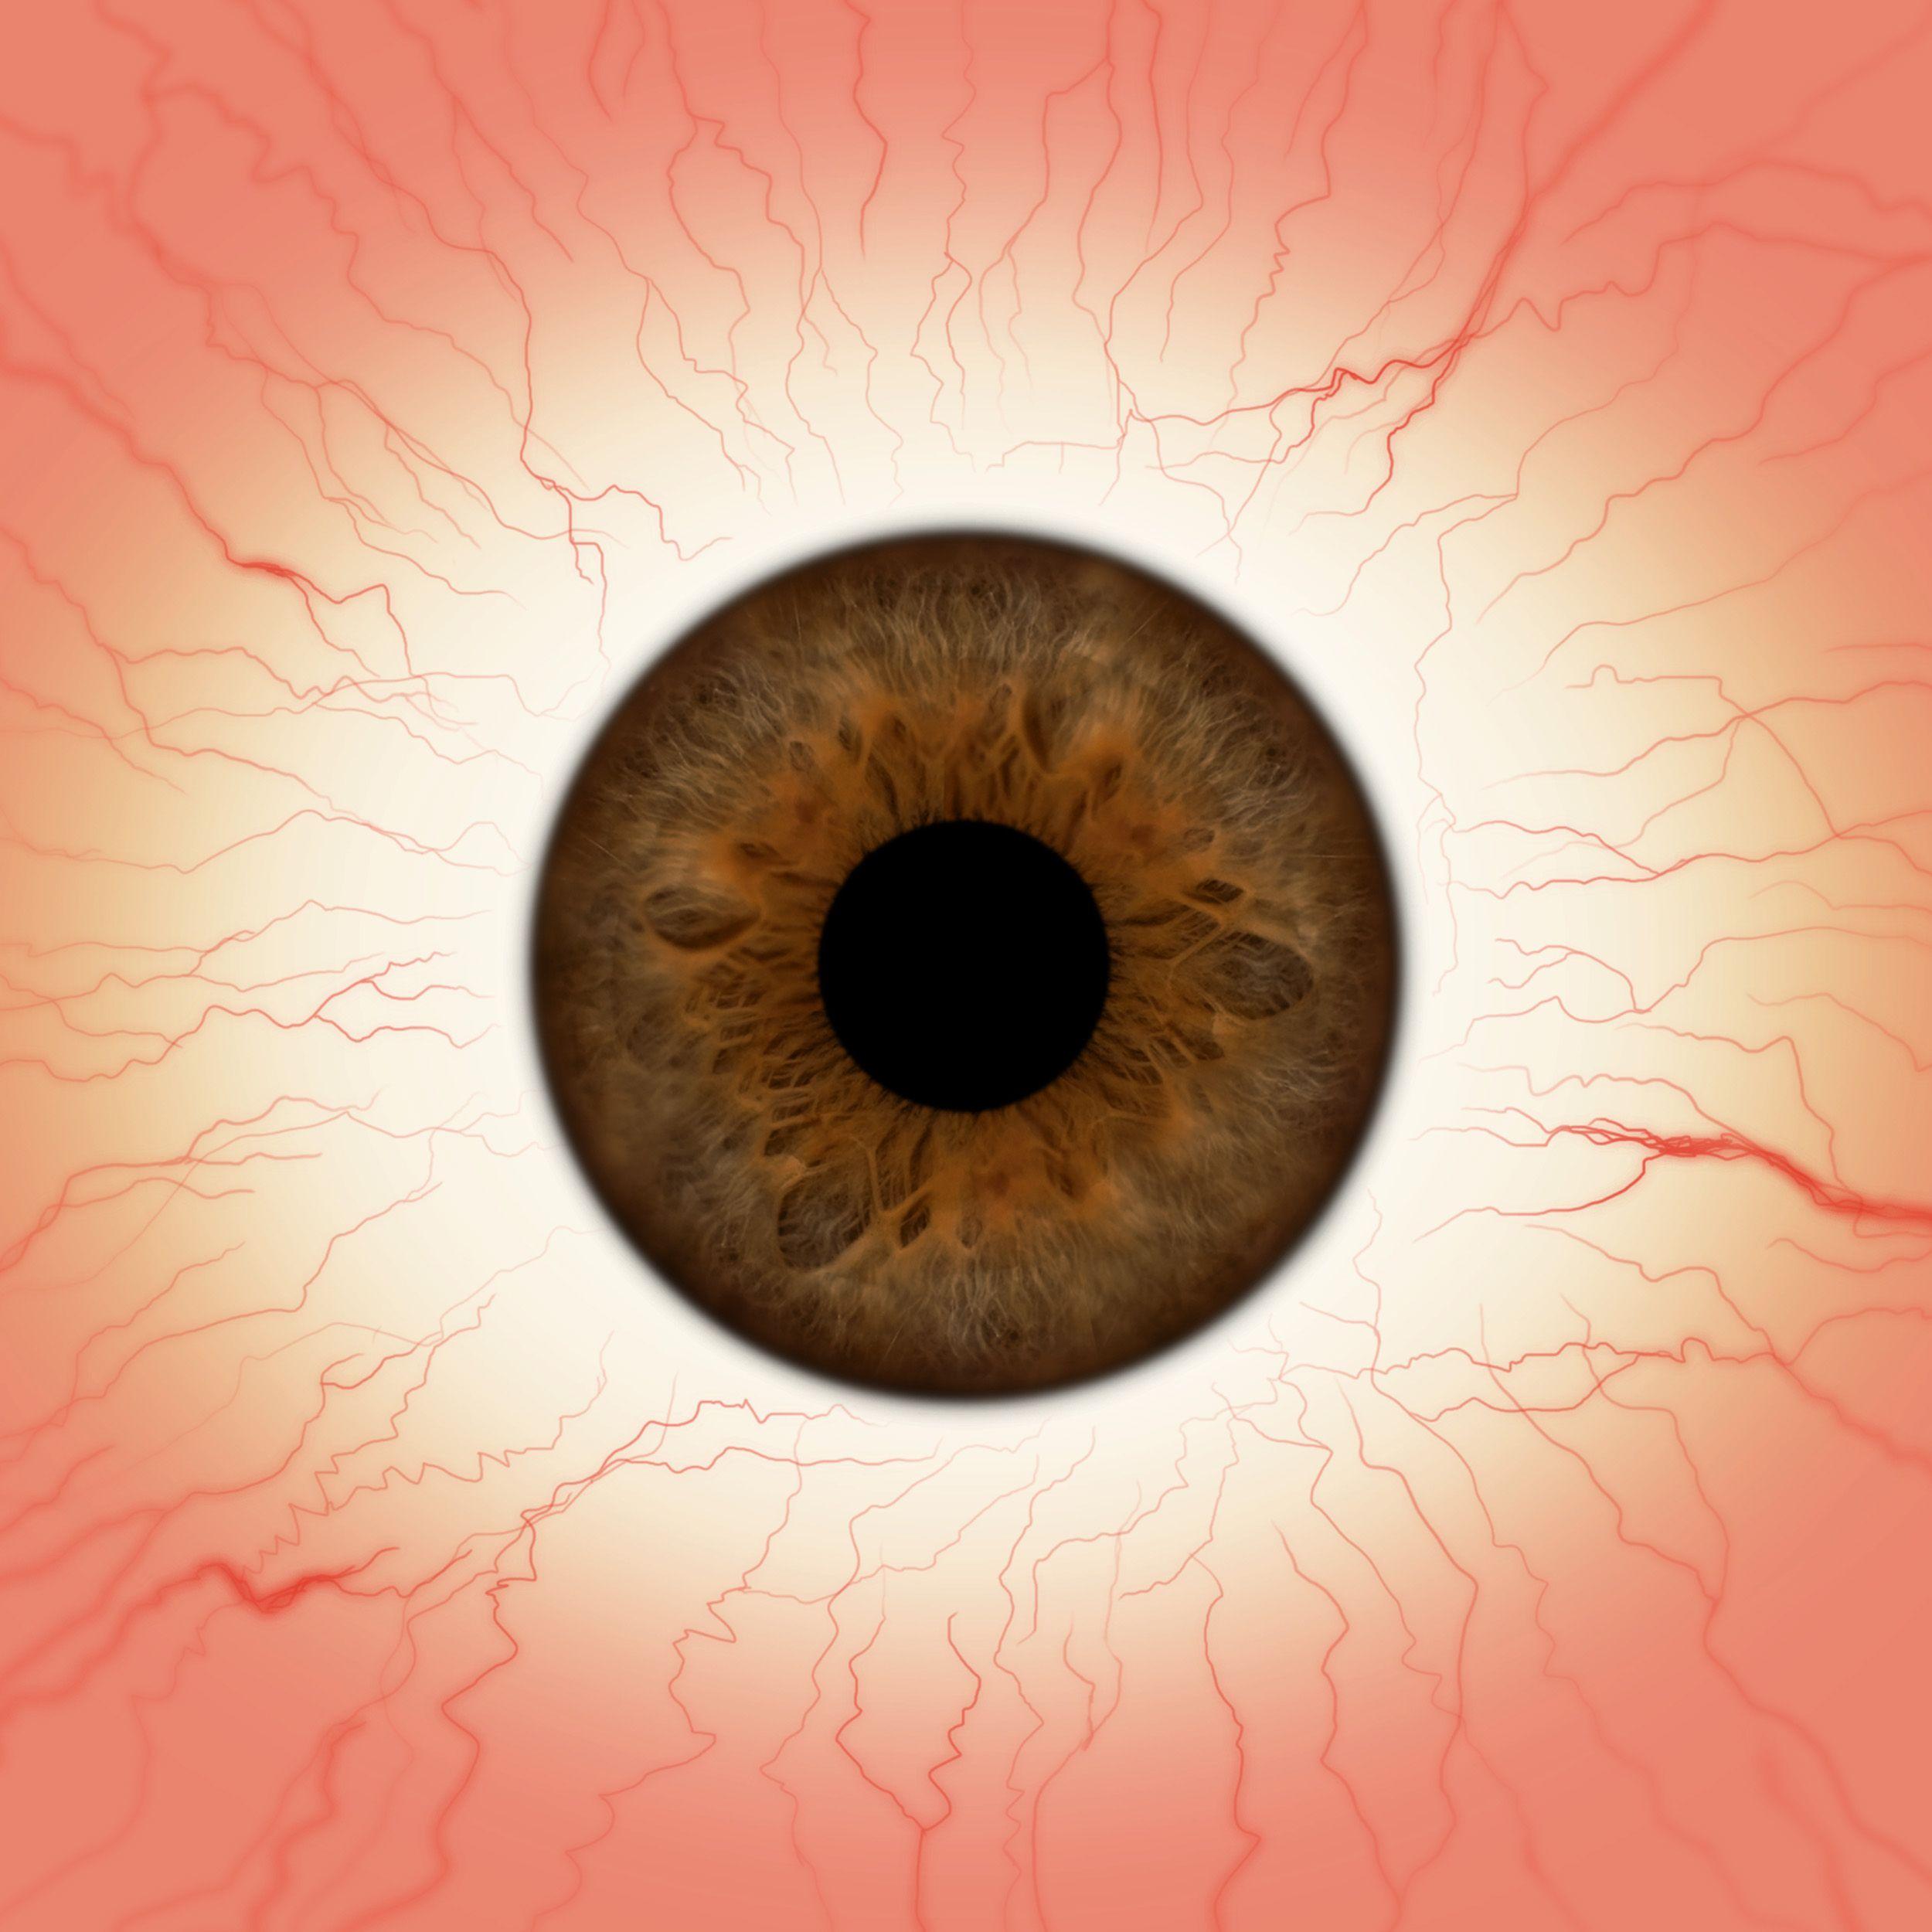 Pin by Sergey Kachnov on texture in 2018 | Pinterest | Eye, Anatomy ...